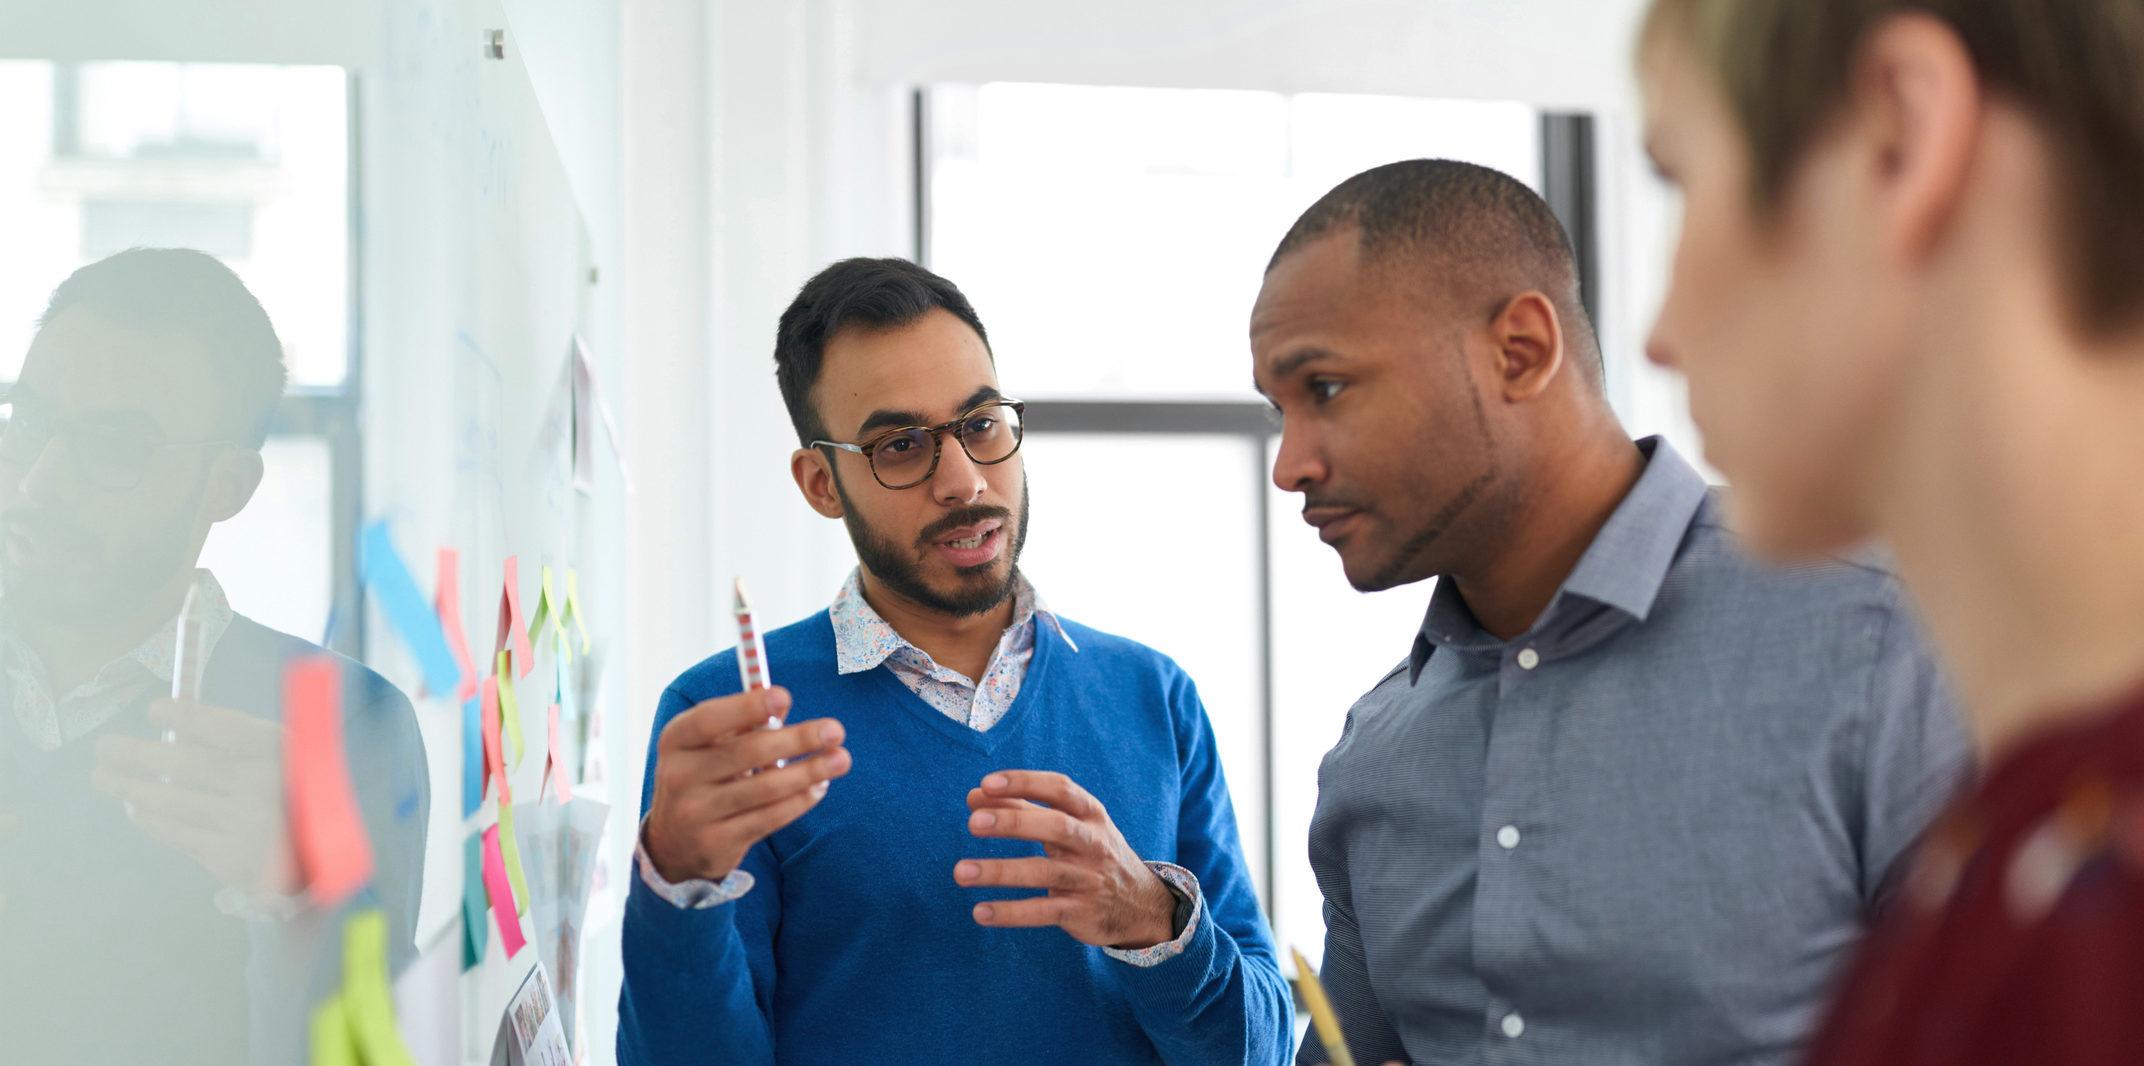 Entrepreneurs on Starting a Nonprofit